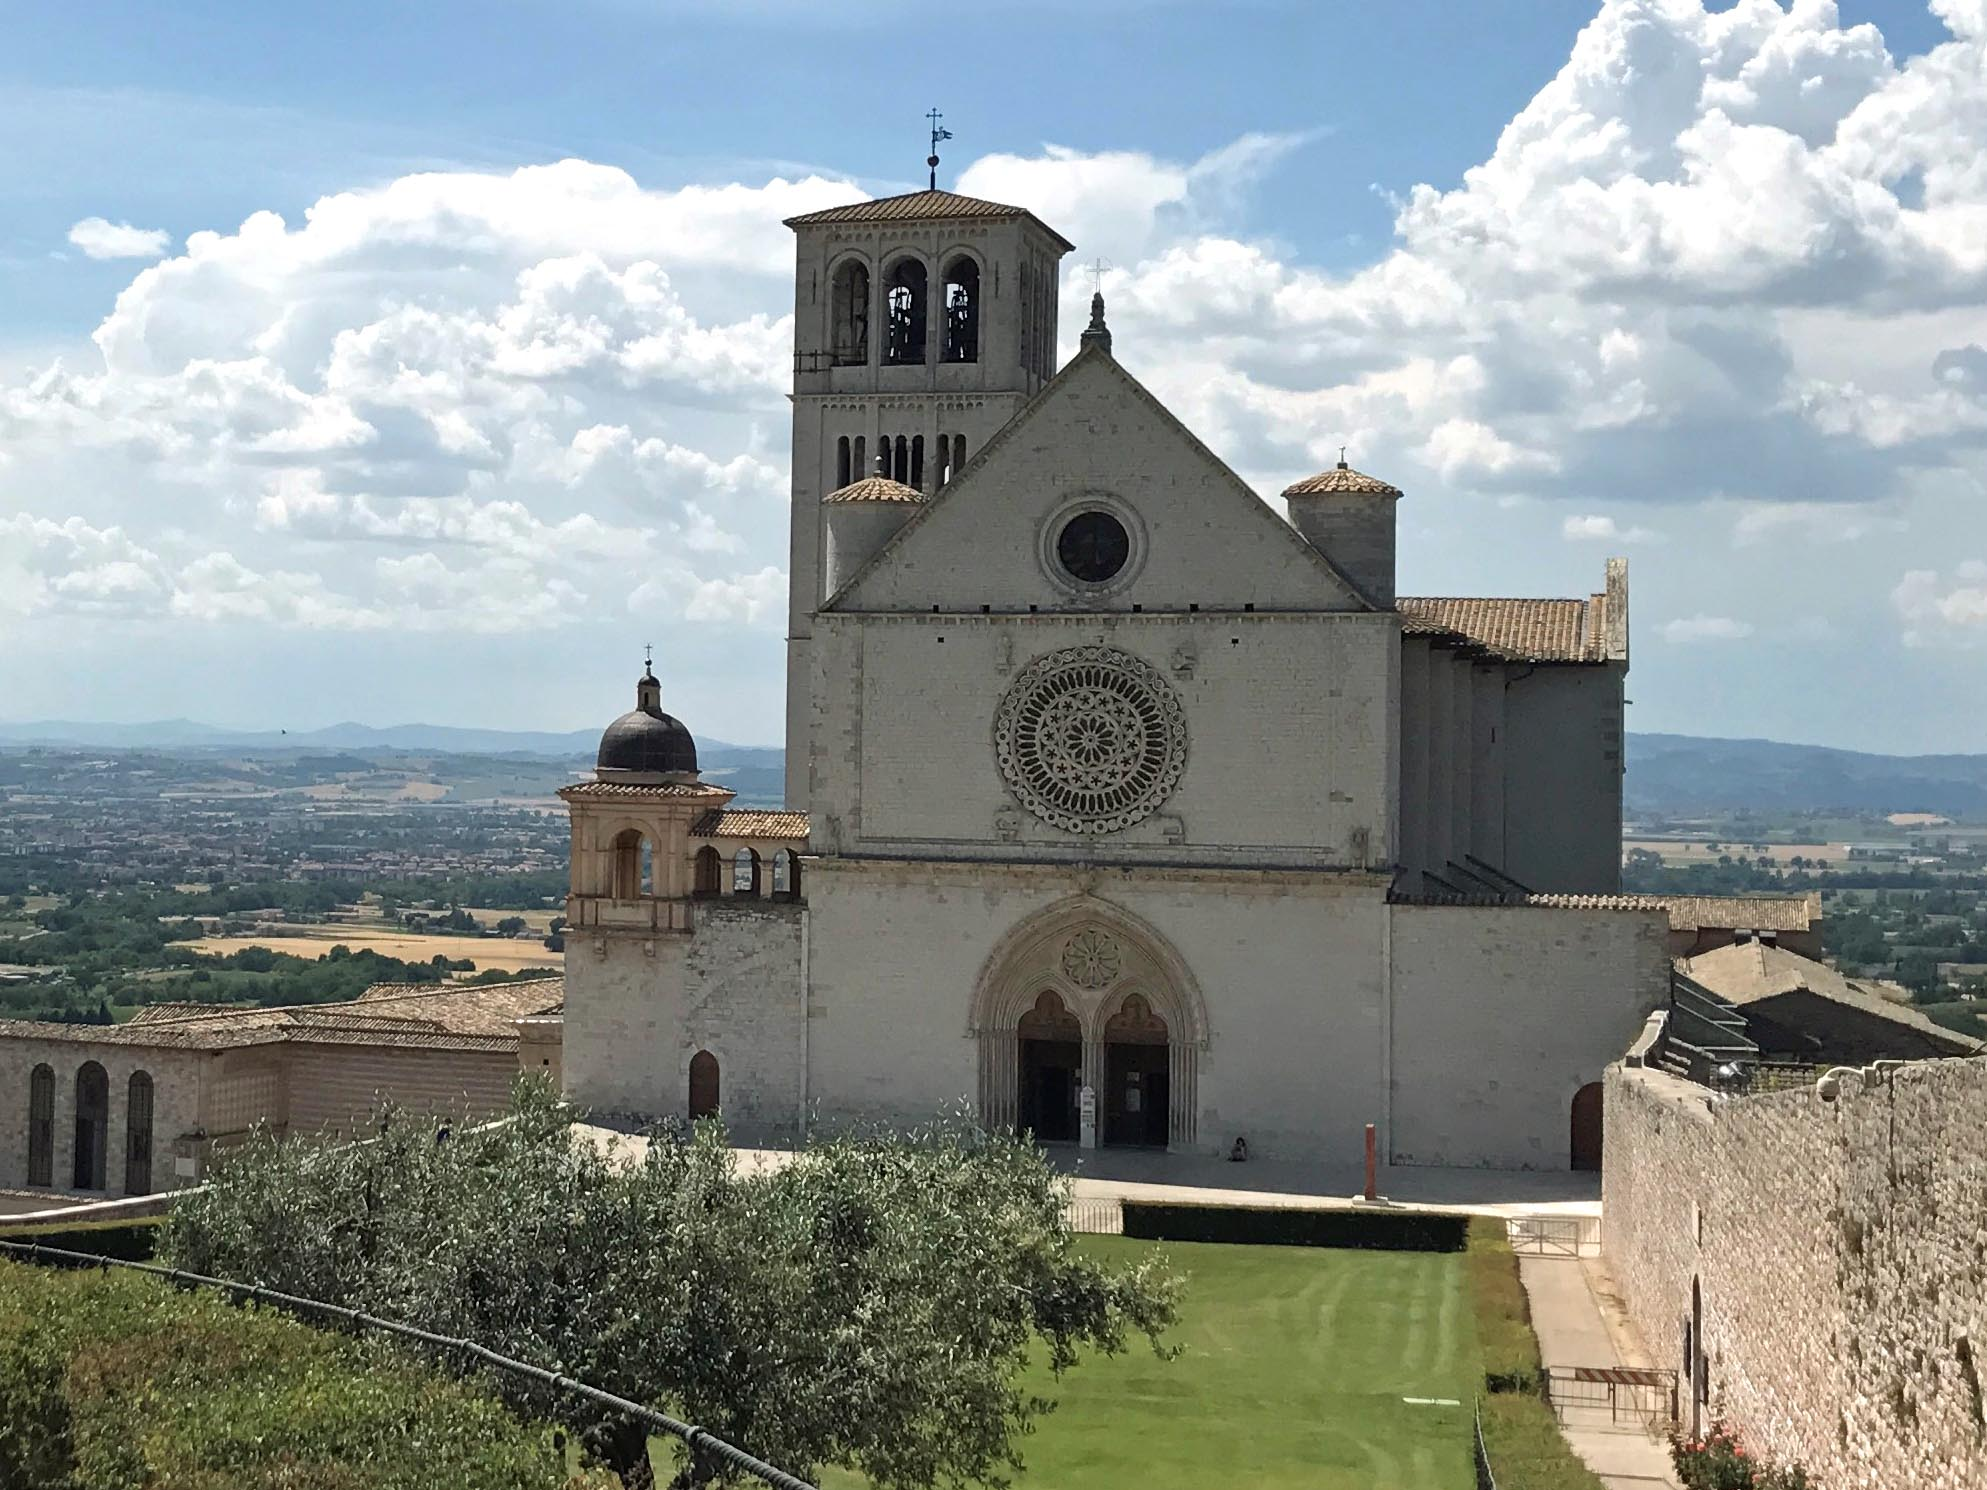 Eines der Ziele der diözesanen Familienwallfahrt 2022: die Basilika San Francesco in Assisi. (Foto: Julia Haas)